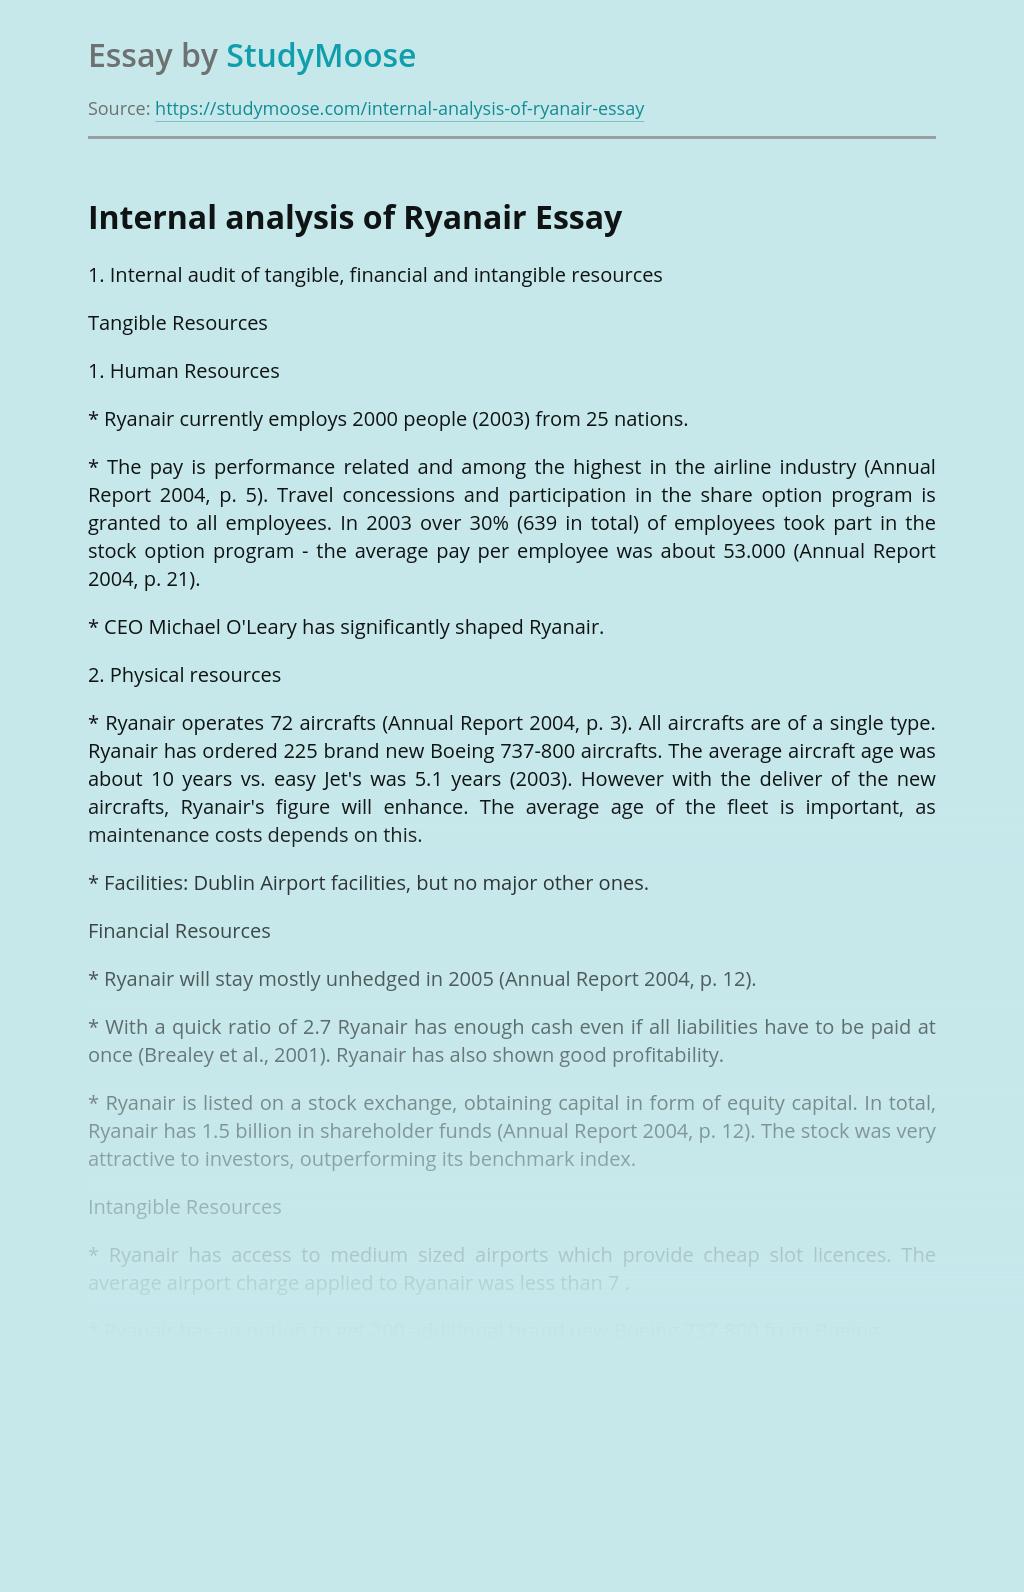 Internal Analysis of Ryanair Company